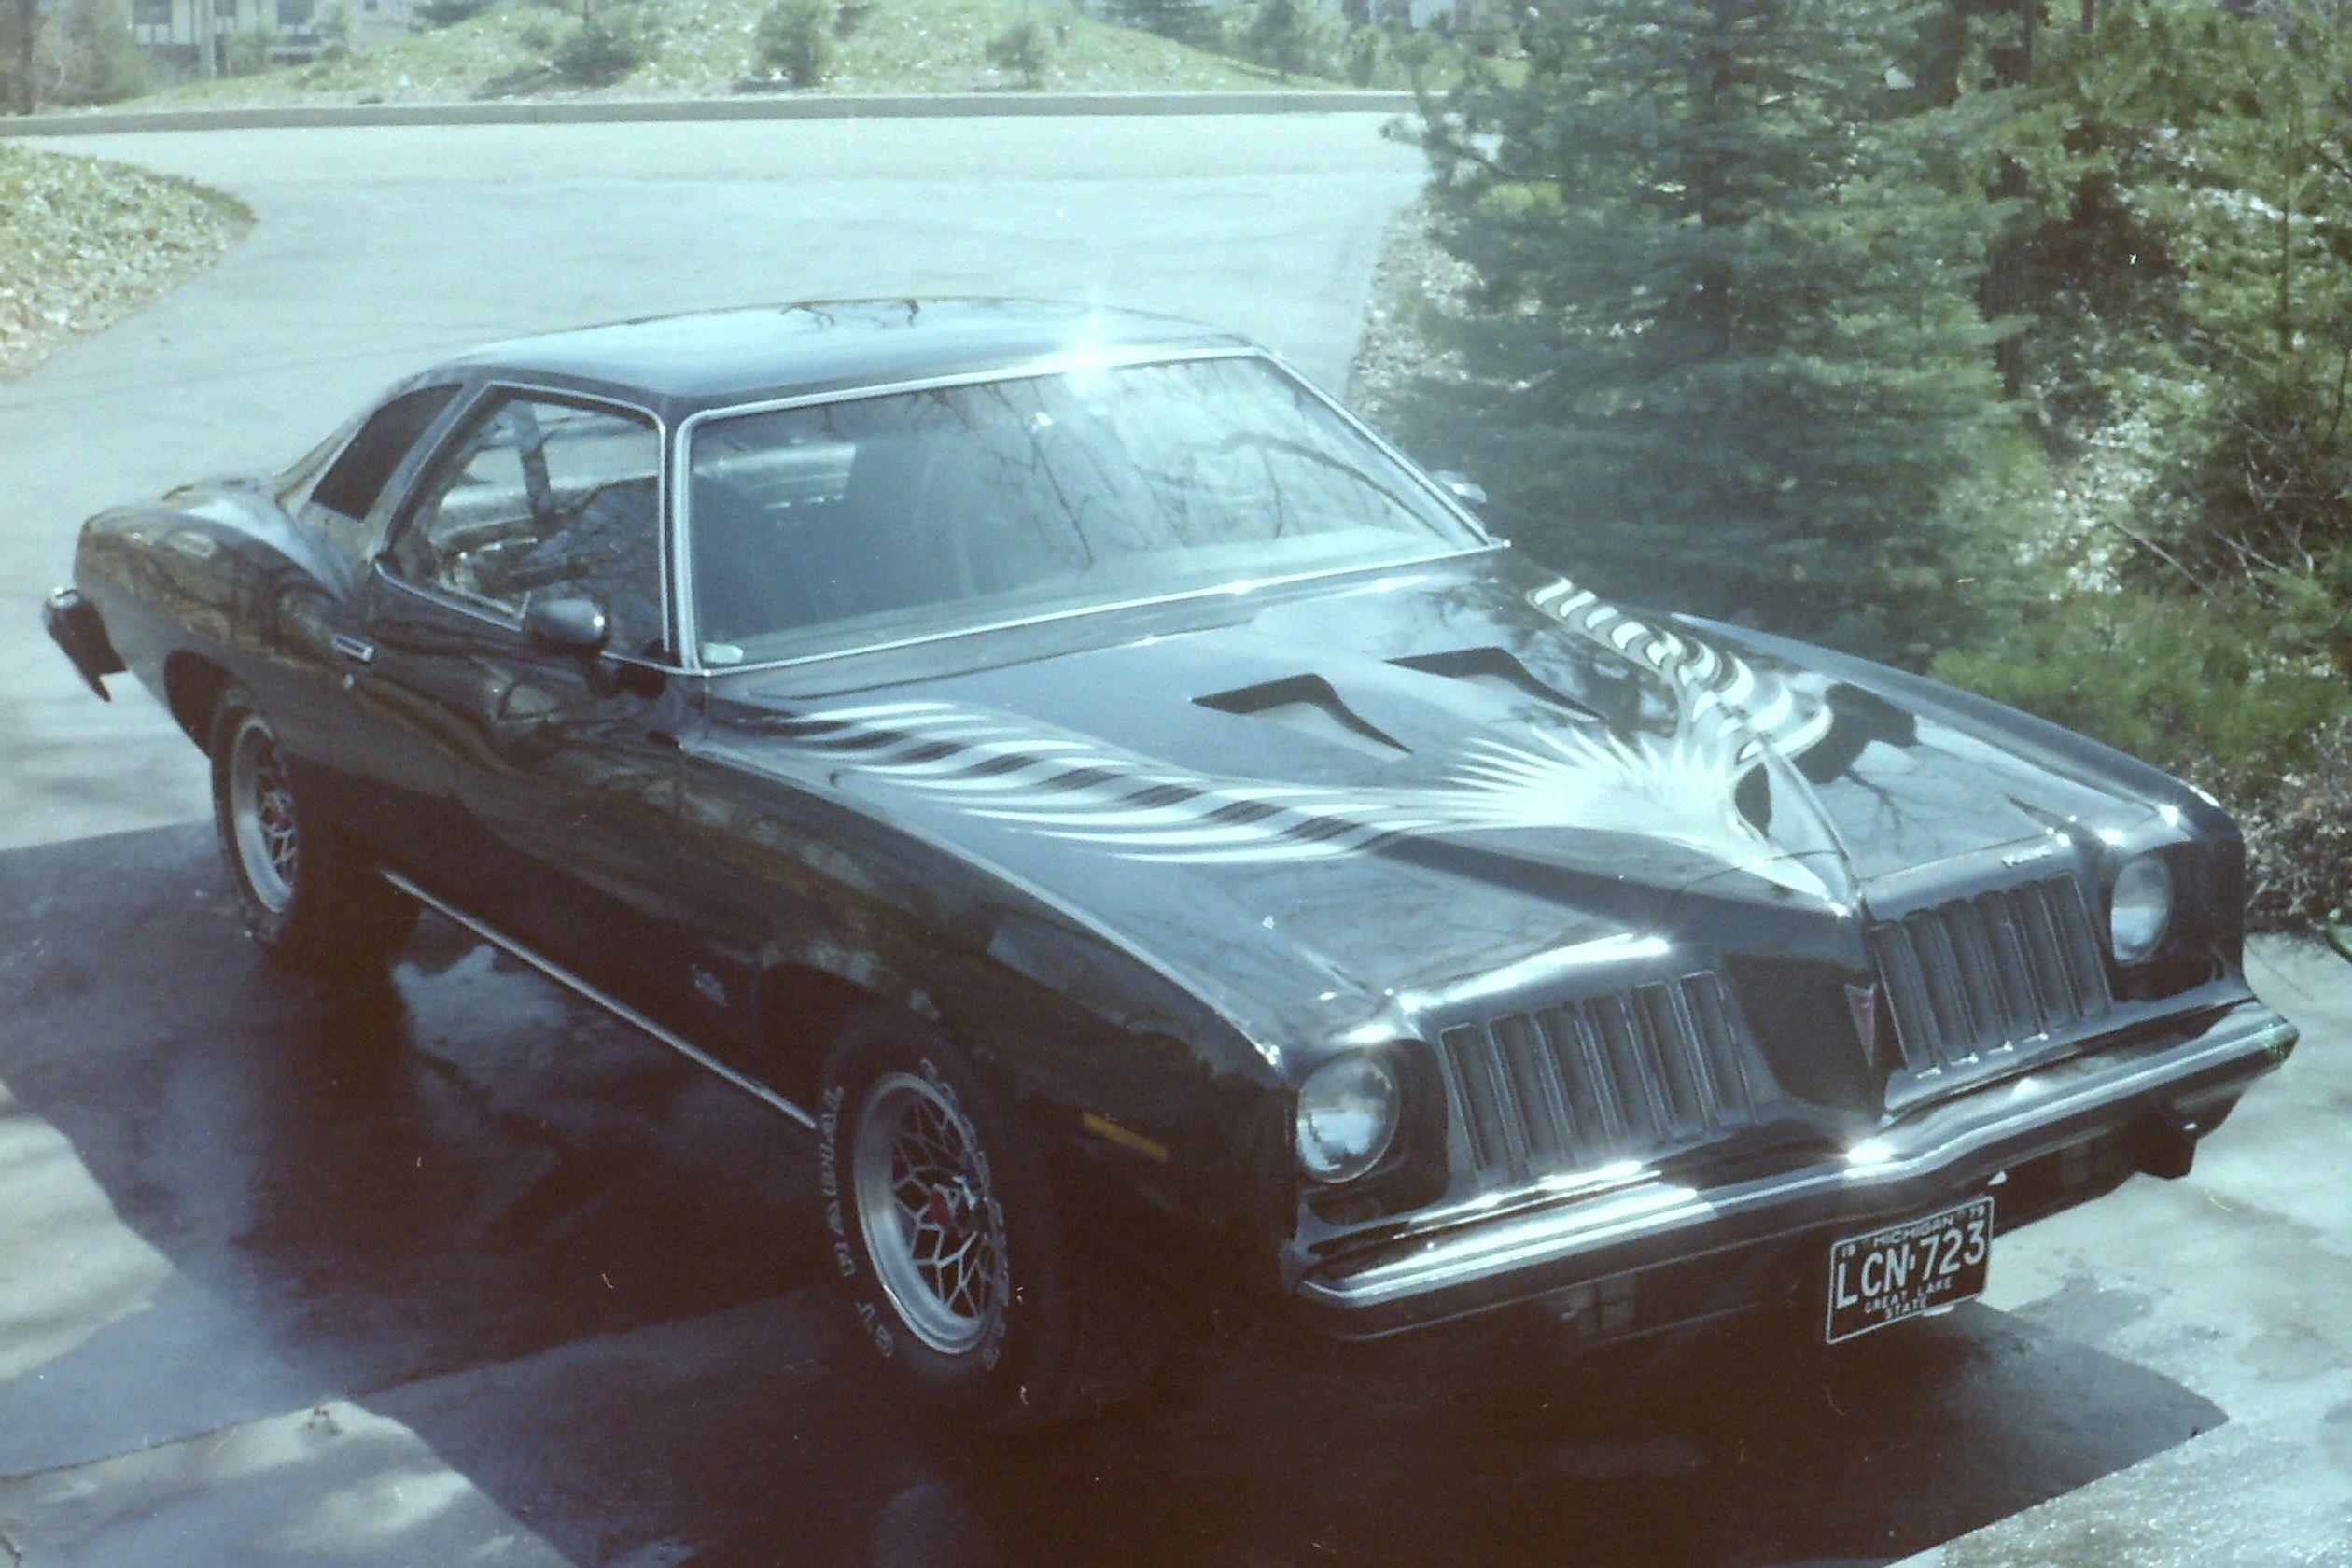 1975 custom pontiac grand am pontiac grand am pontiac gto firebird grand prix [ 2520 x 1680 Pixel ]